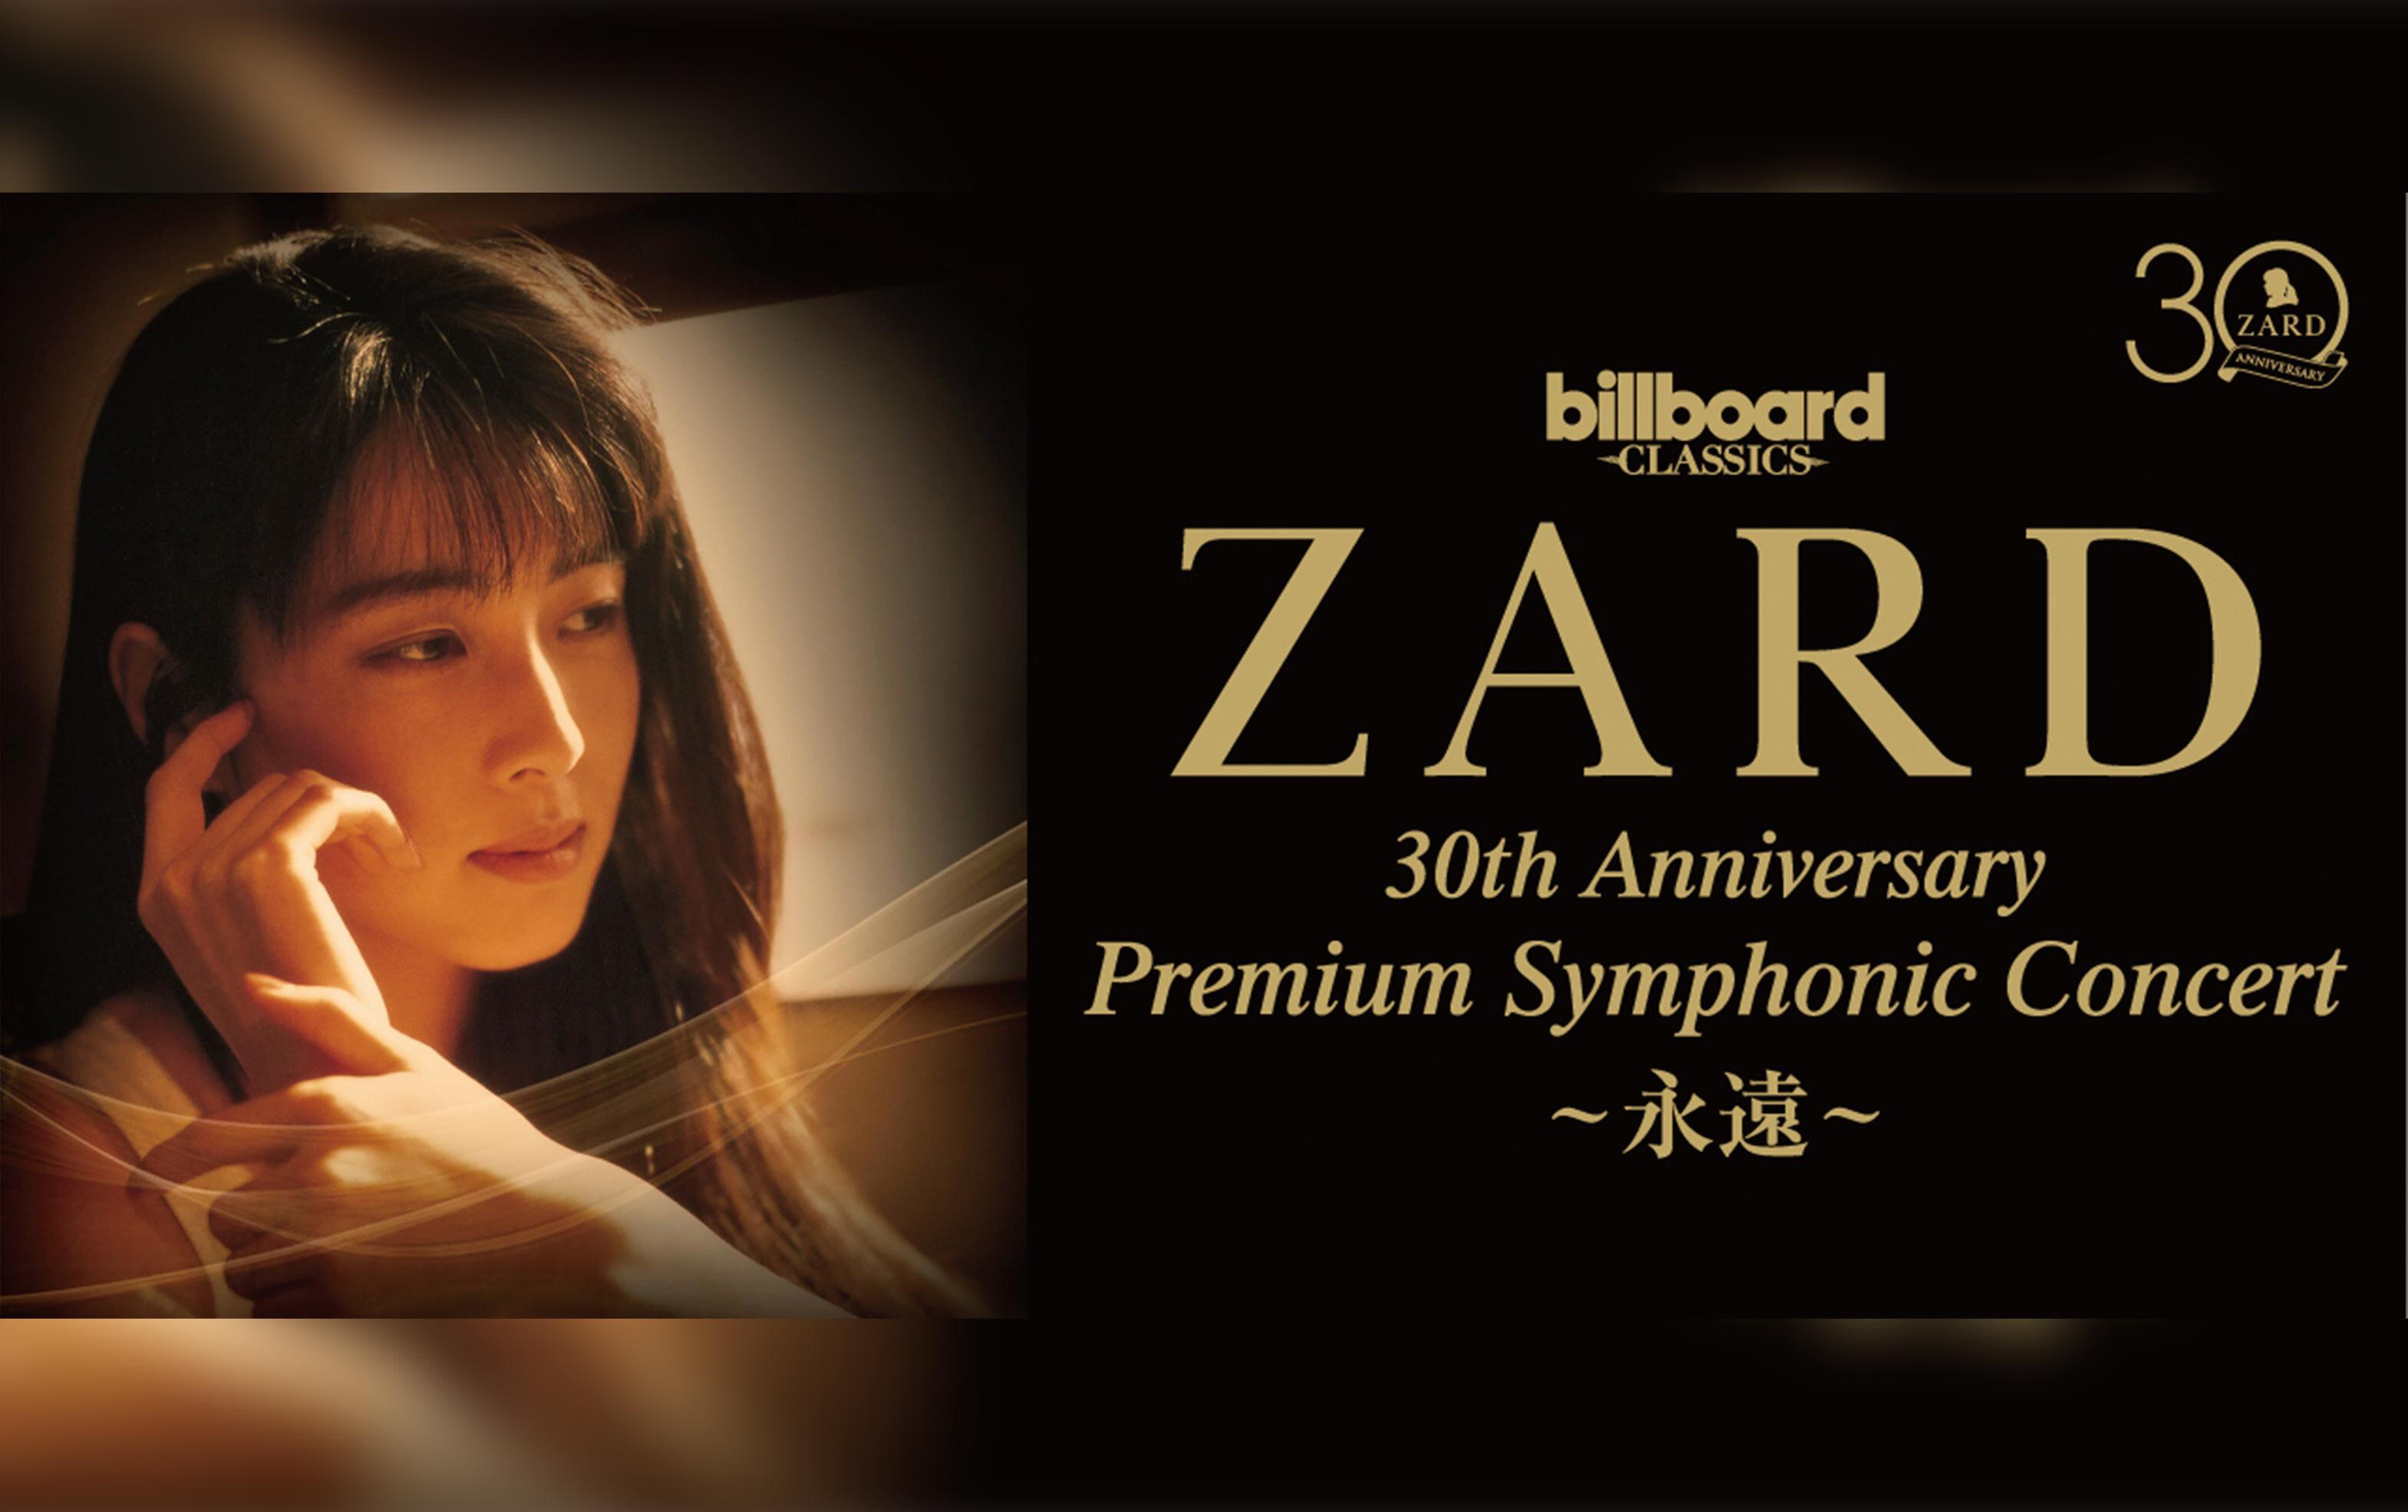 「ZARD 30th Anniversary Premium Symphonic Concert ~ 永 遠 ~」振替公演